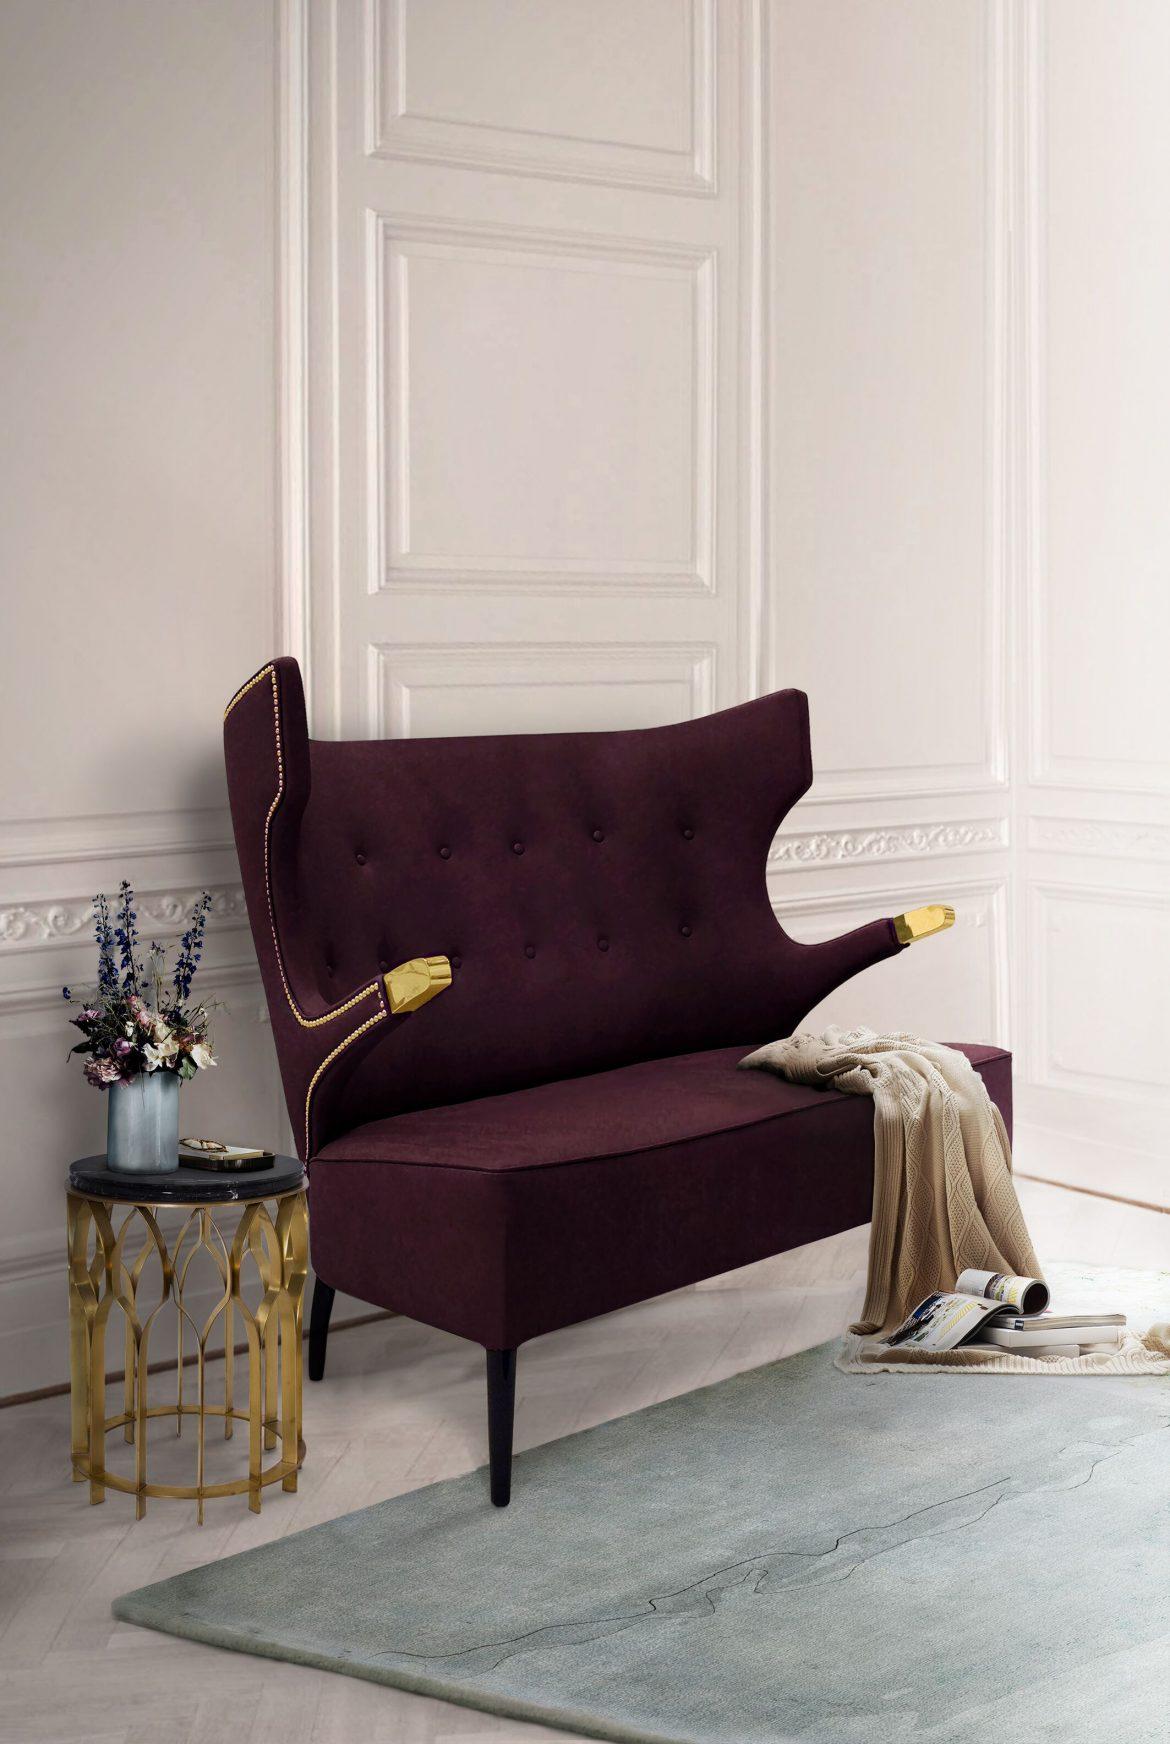 living room ideas 30 Best Living Room Ideas For 2020 best living room ideas 2020 13